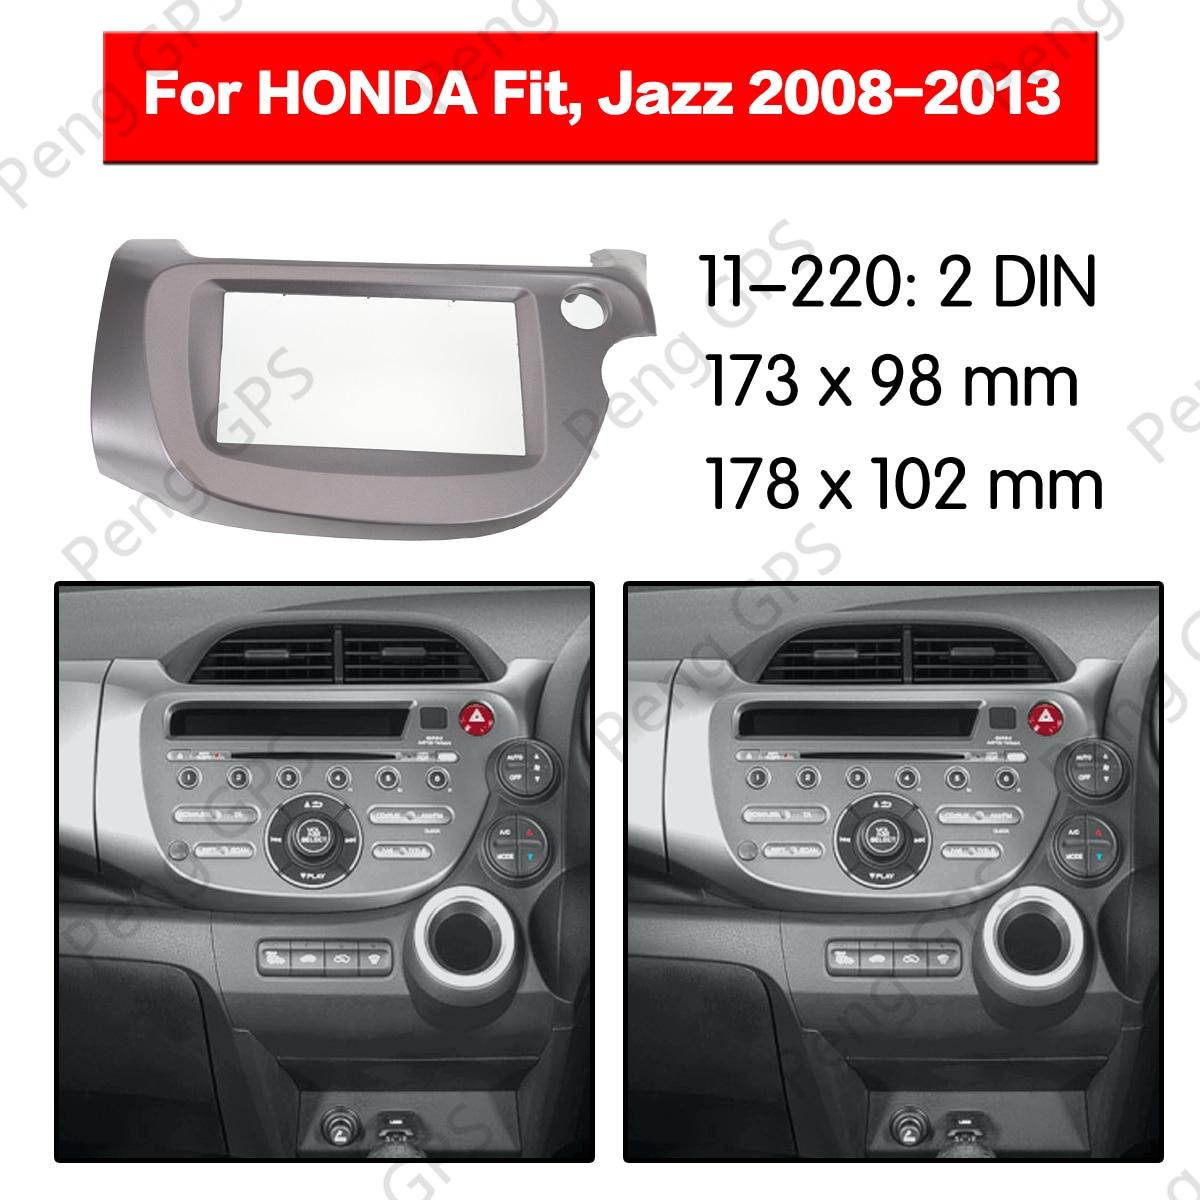 2 Din Car Radio stereo Fitting installation fascia For HONDA Fit Jazz 2008-2013 Stereo Frame Fascias Mount Panel DVD CD trim ABS